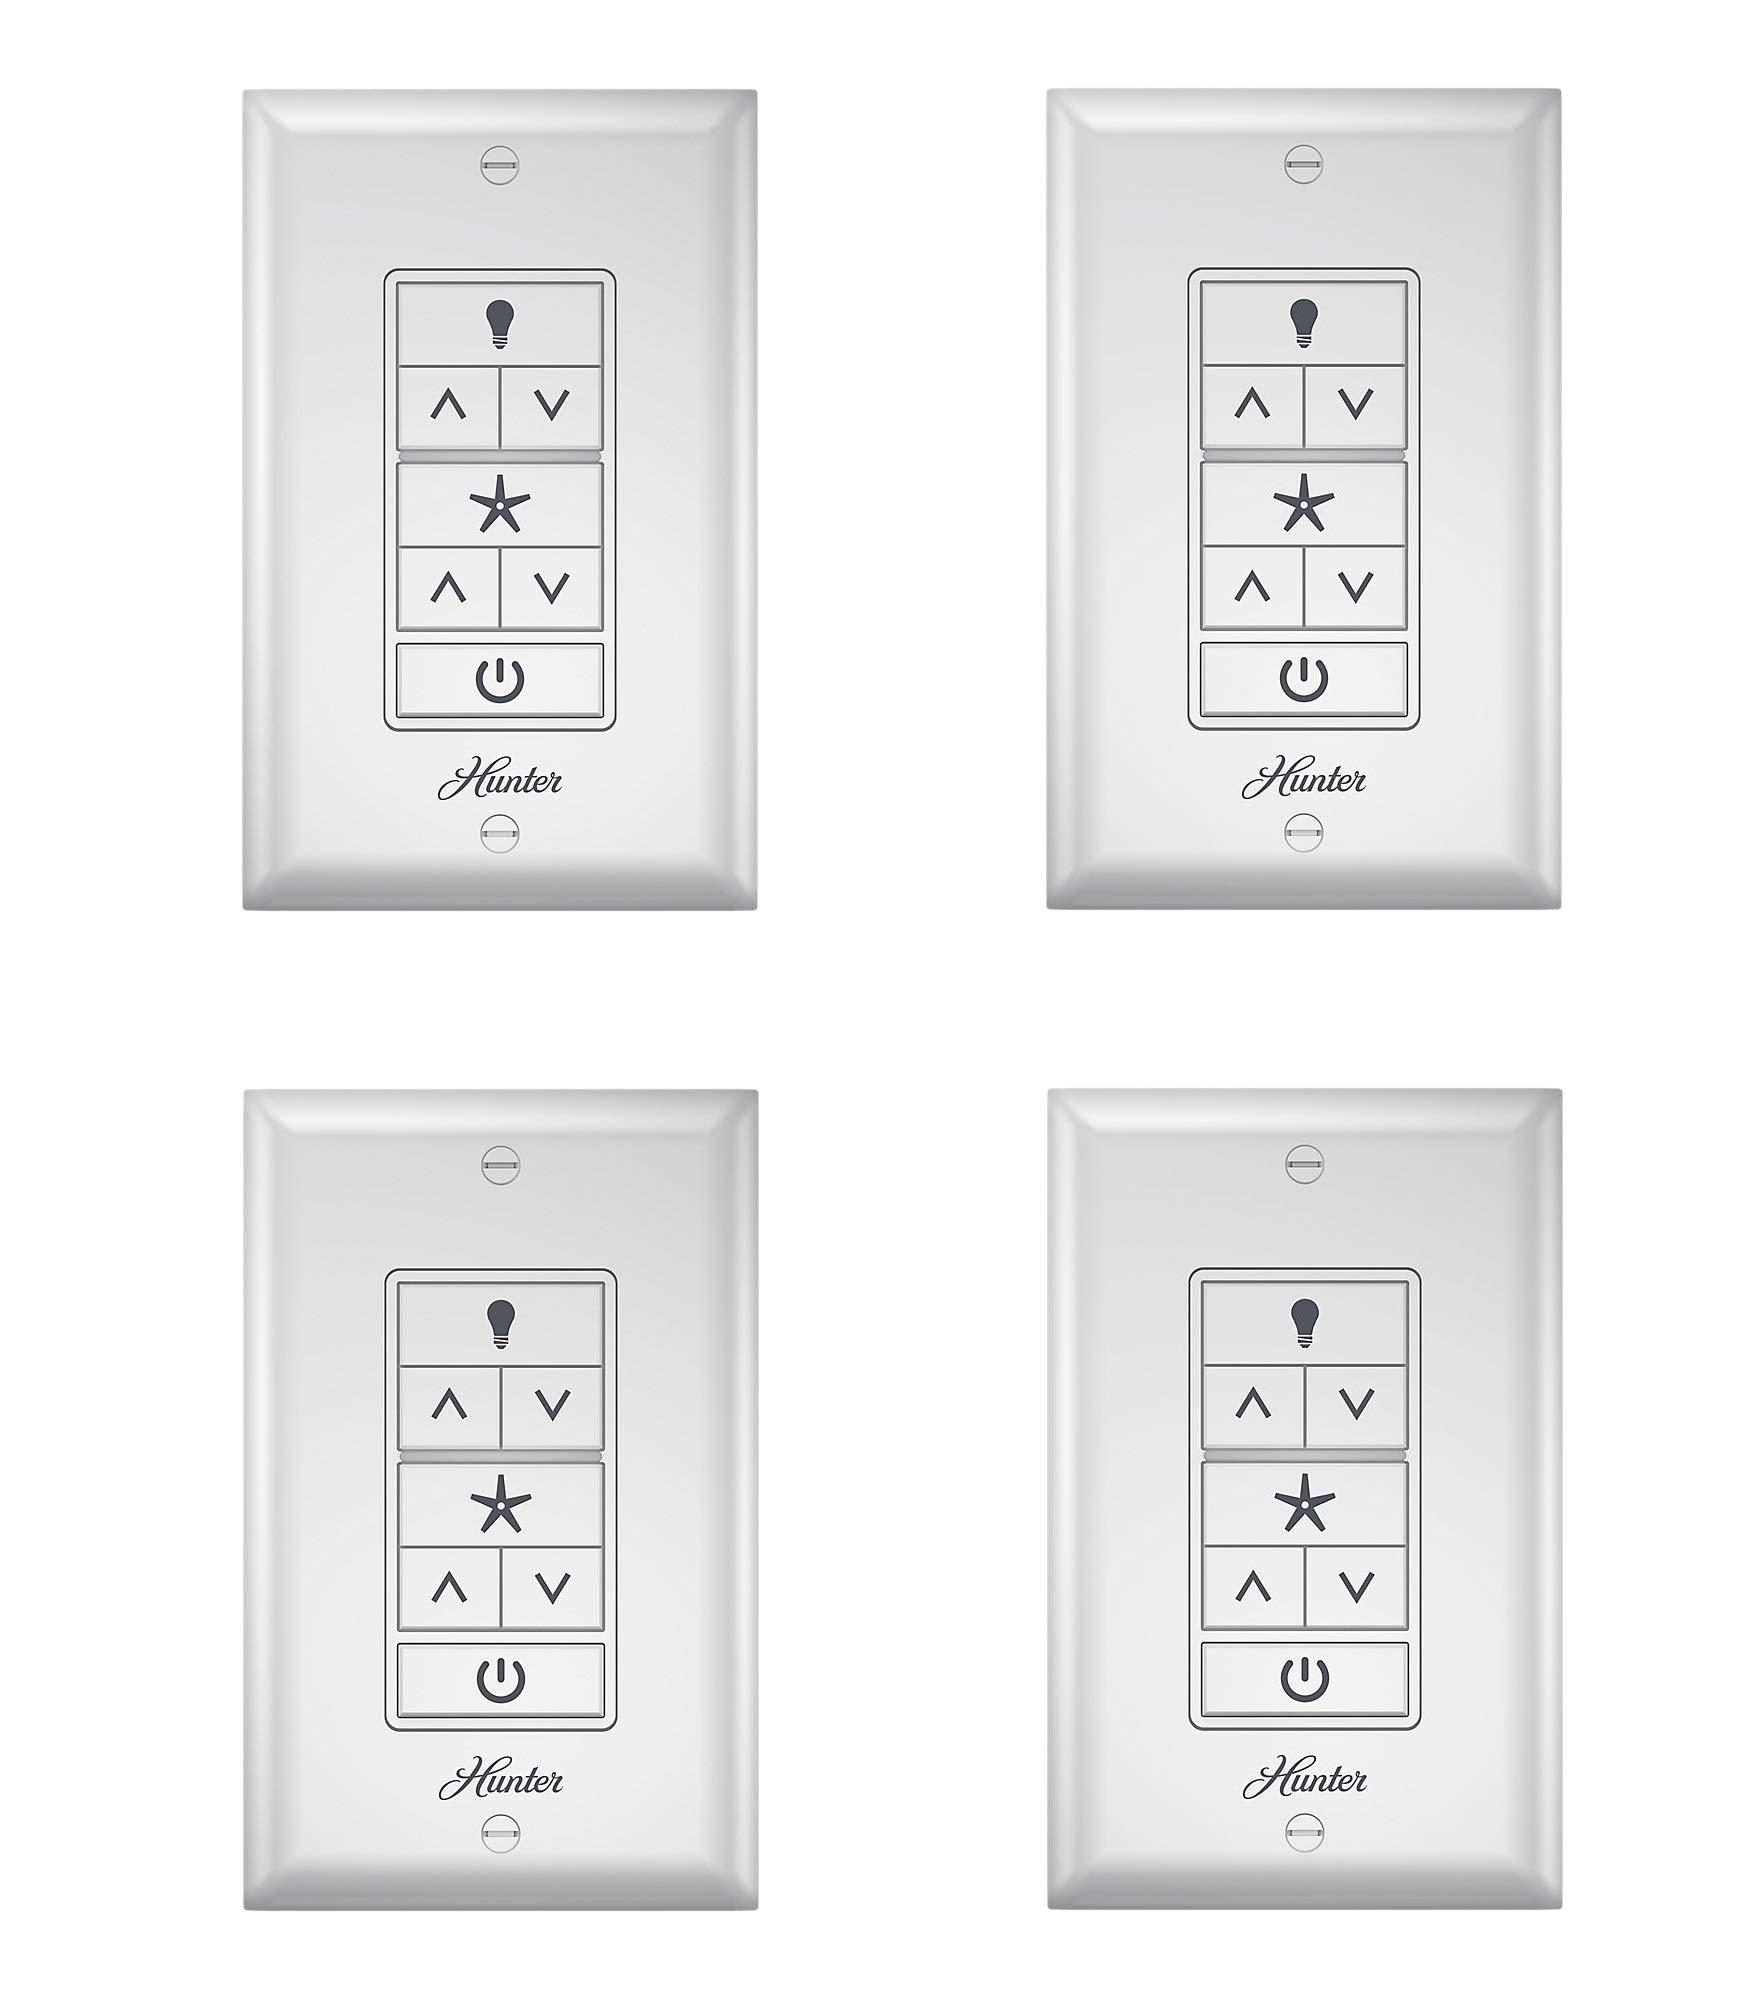 Hunter 99375 Universal Ceiling Fan Wall Control Universal Ceiling Fan Wall Controlwhite (Pack of 4)